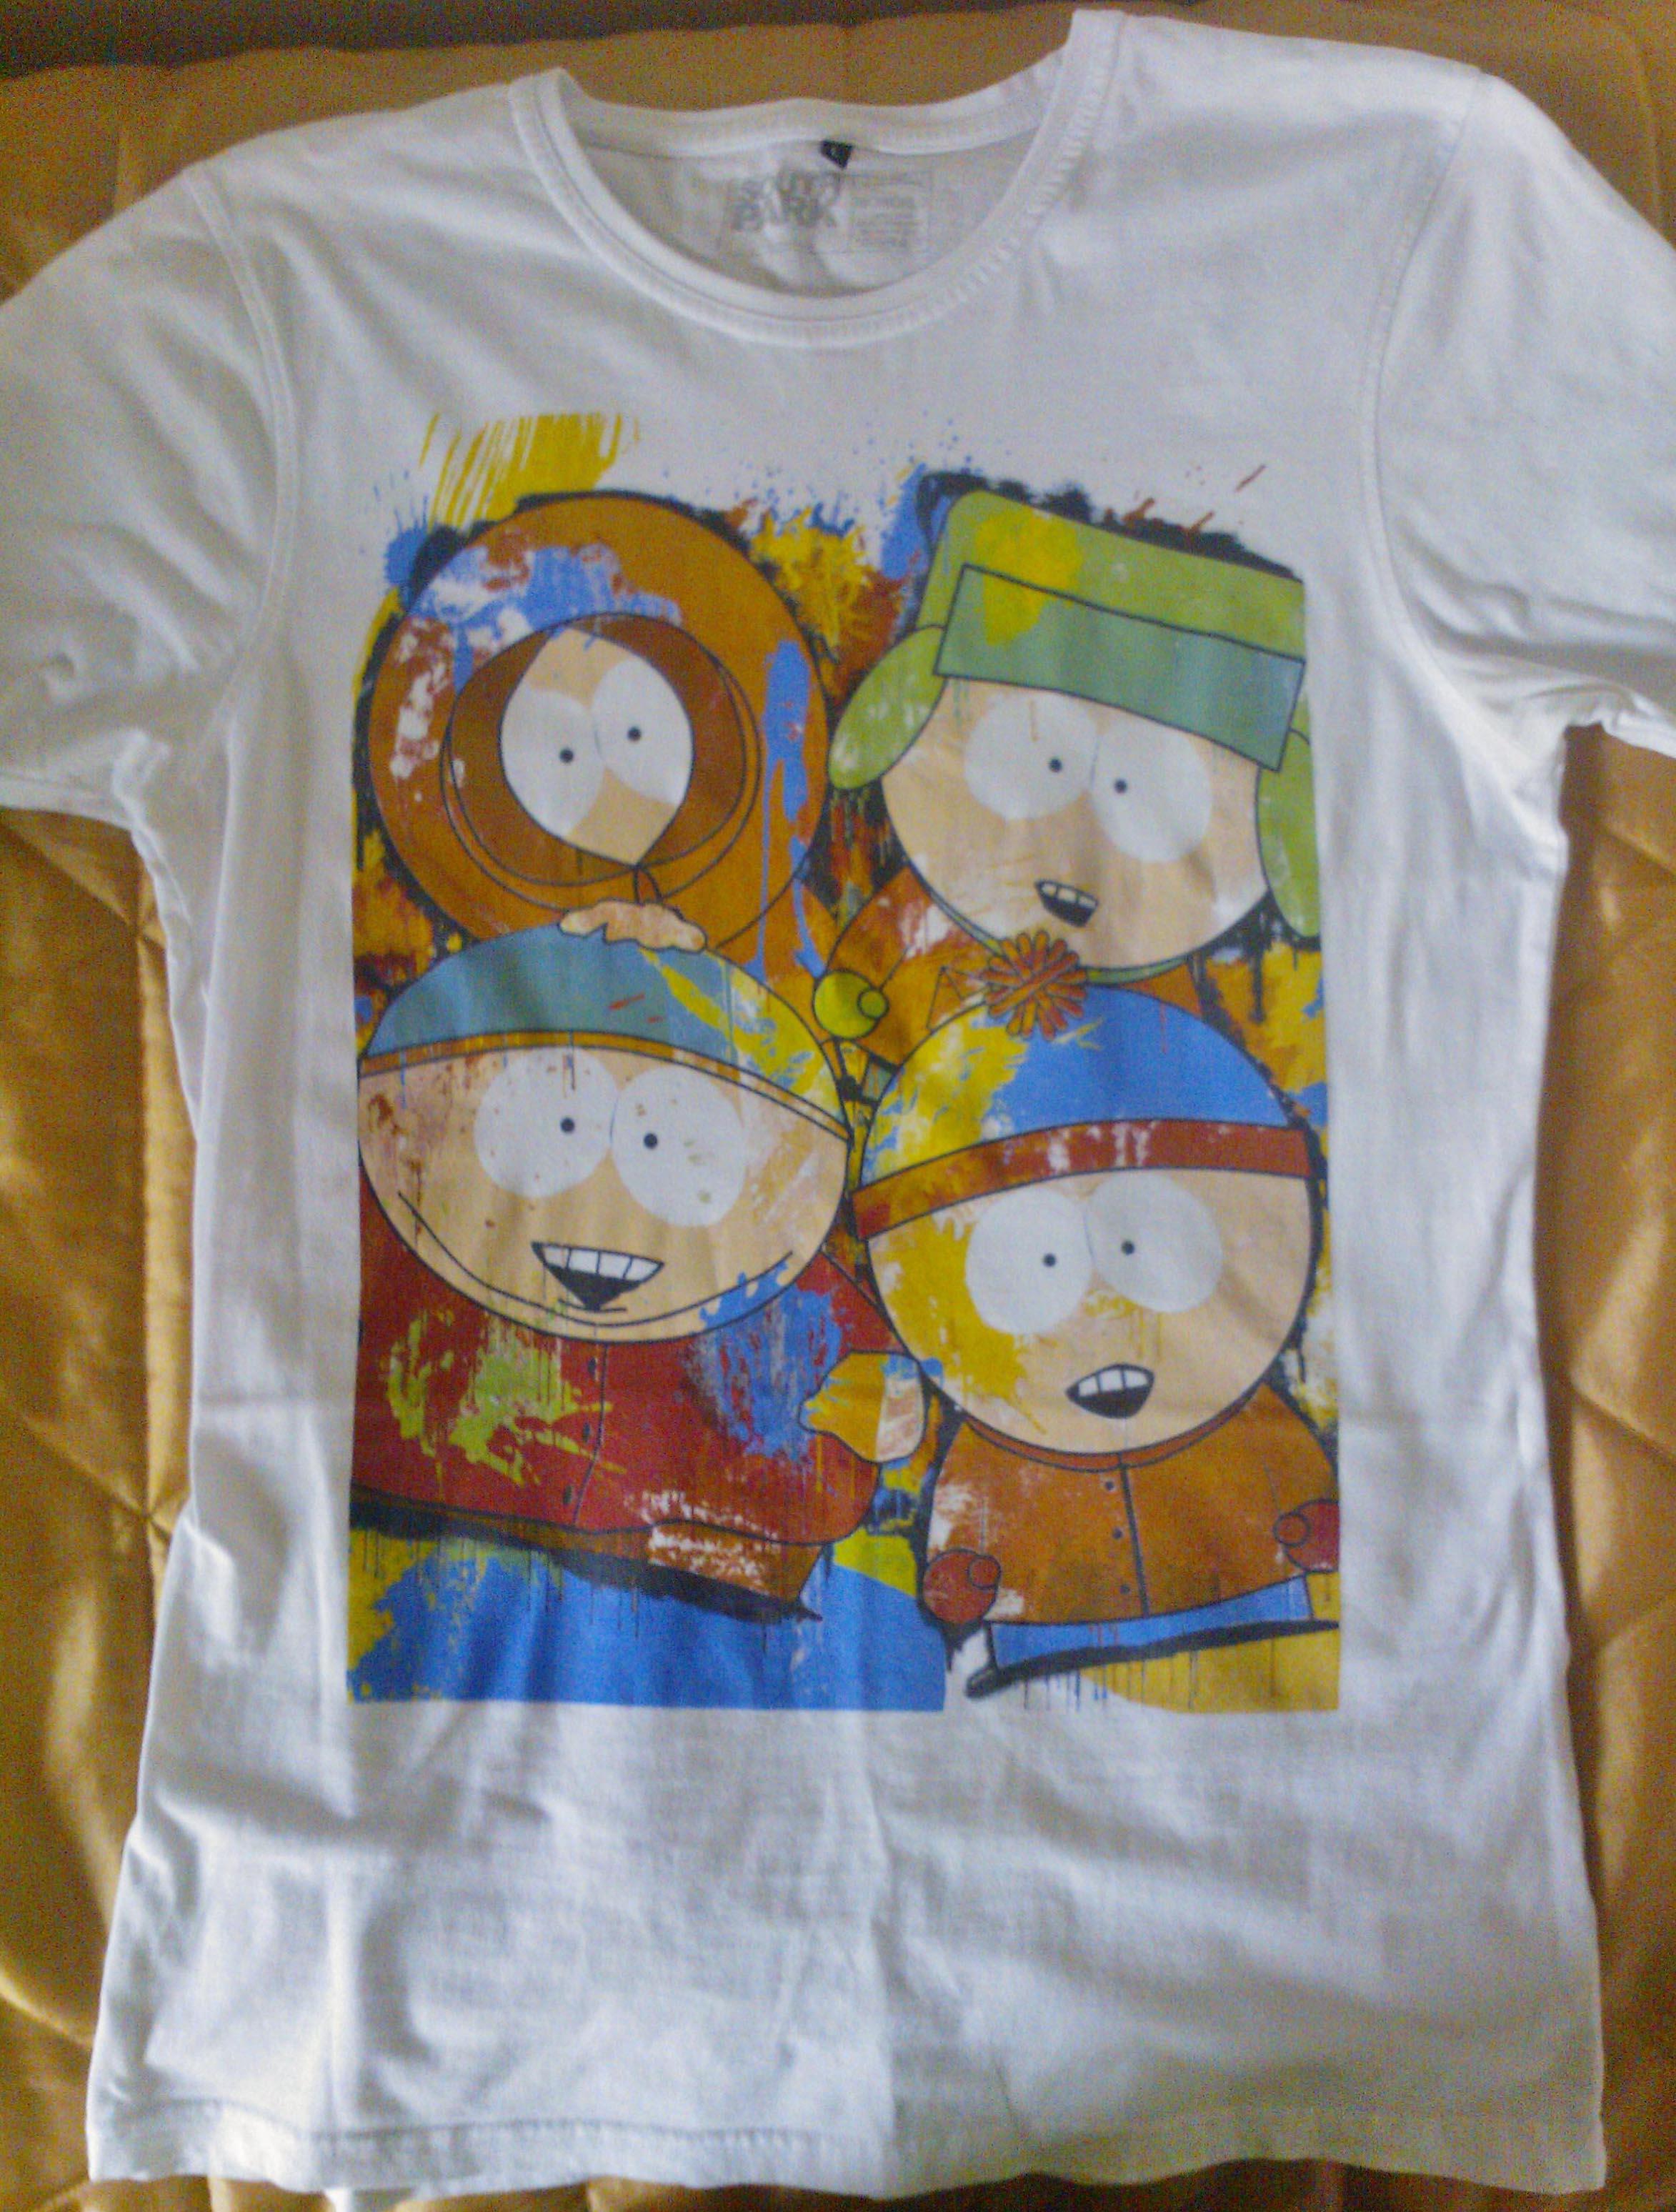 My Second South Park T-shirt by megasupermoon